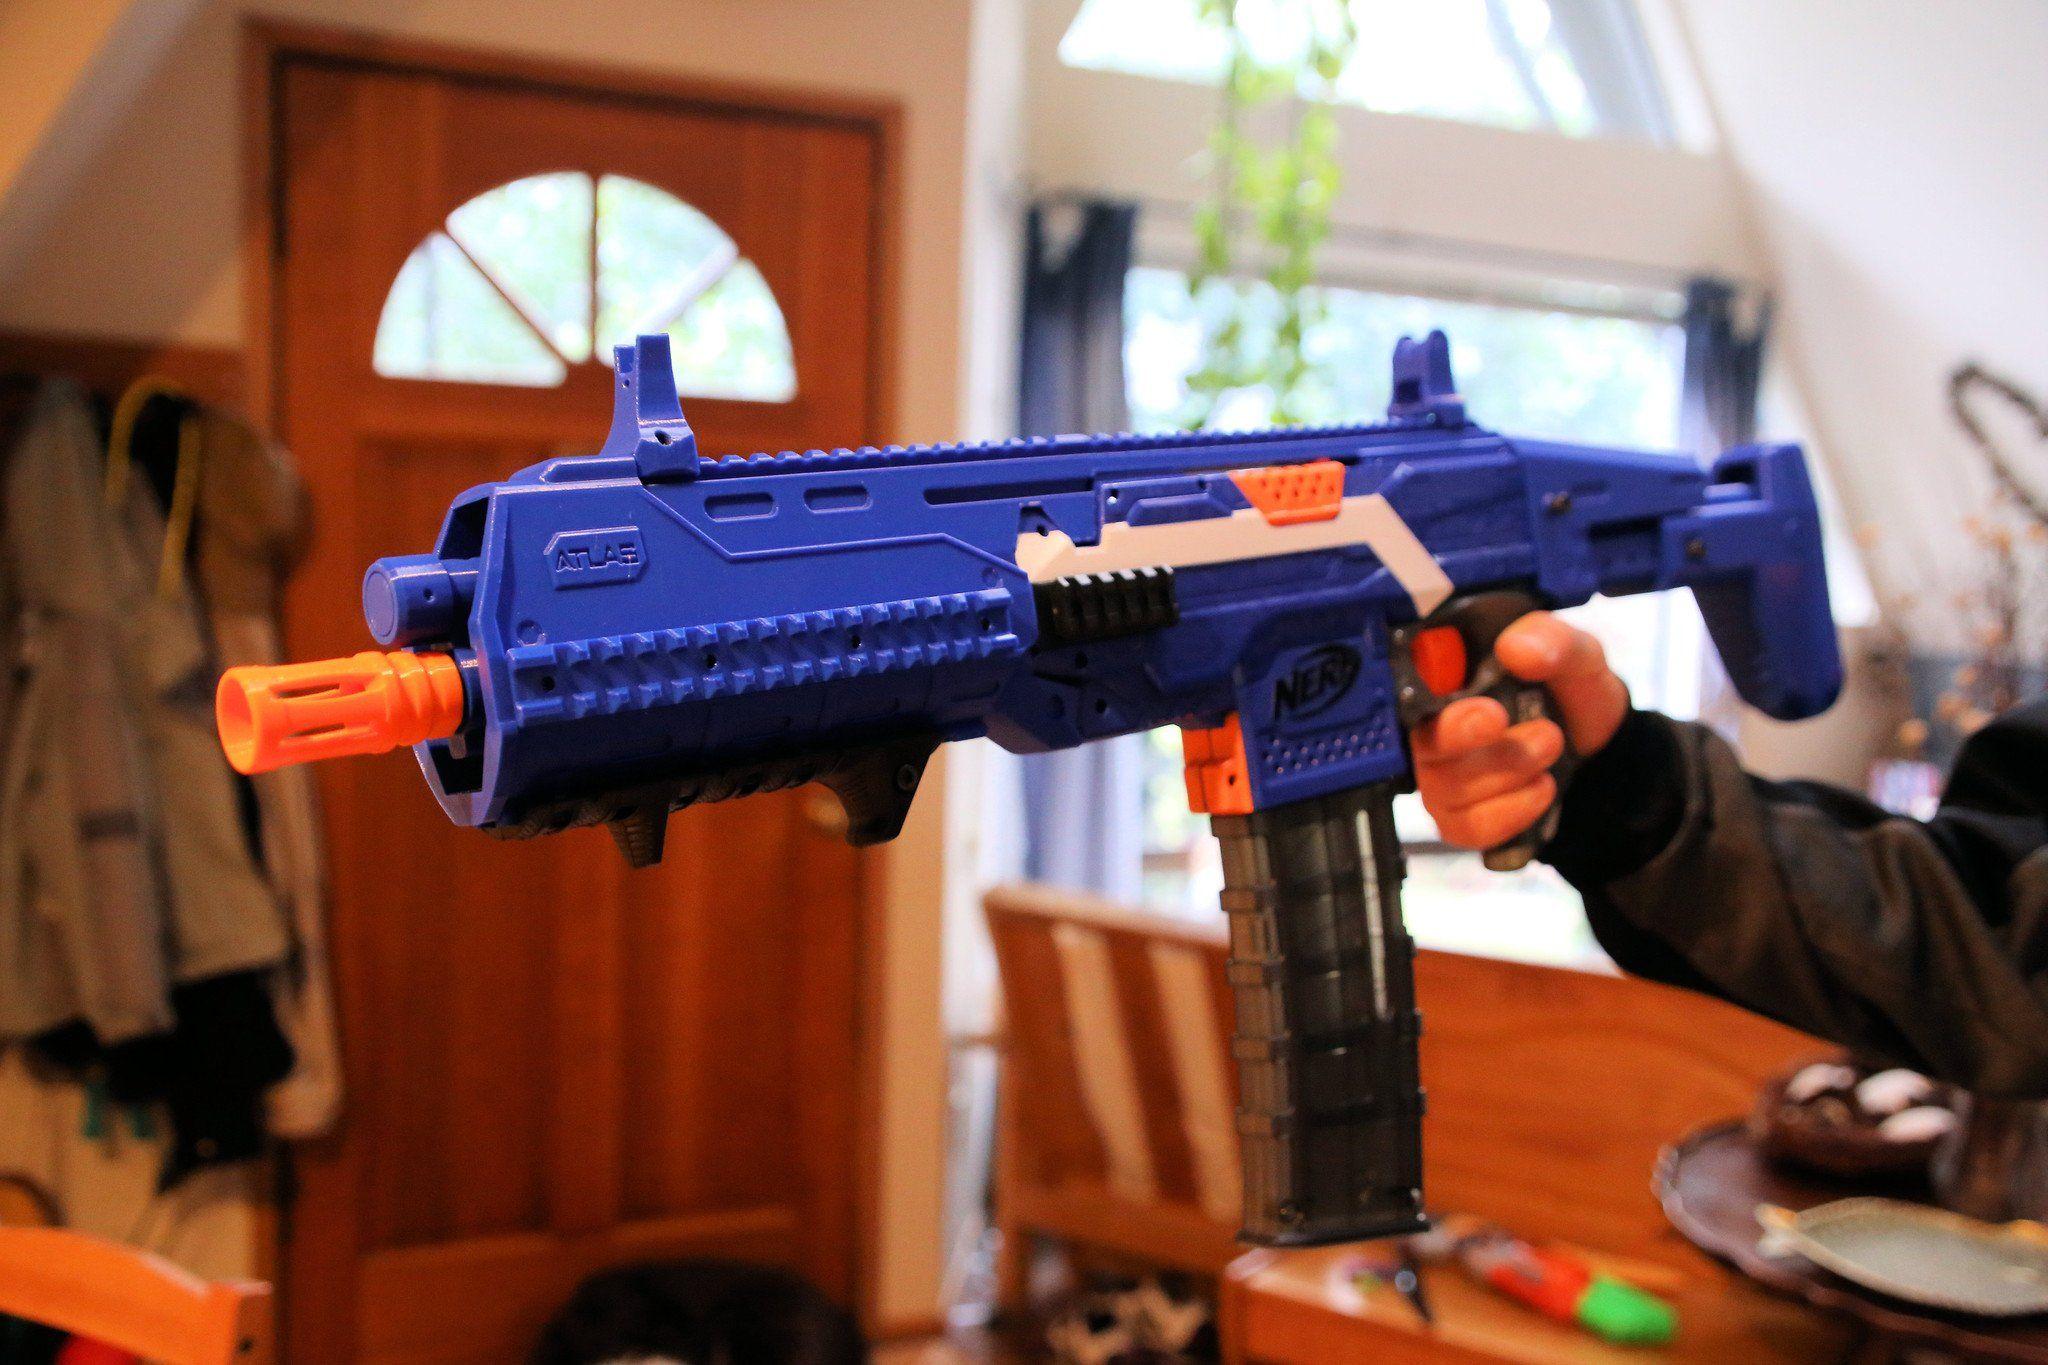 Nerf Gun, Airsoft, Clarinet, Arsenal, Guns, Weapons, Weapons Guns, Weapons  Guns, Nerf Rifle